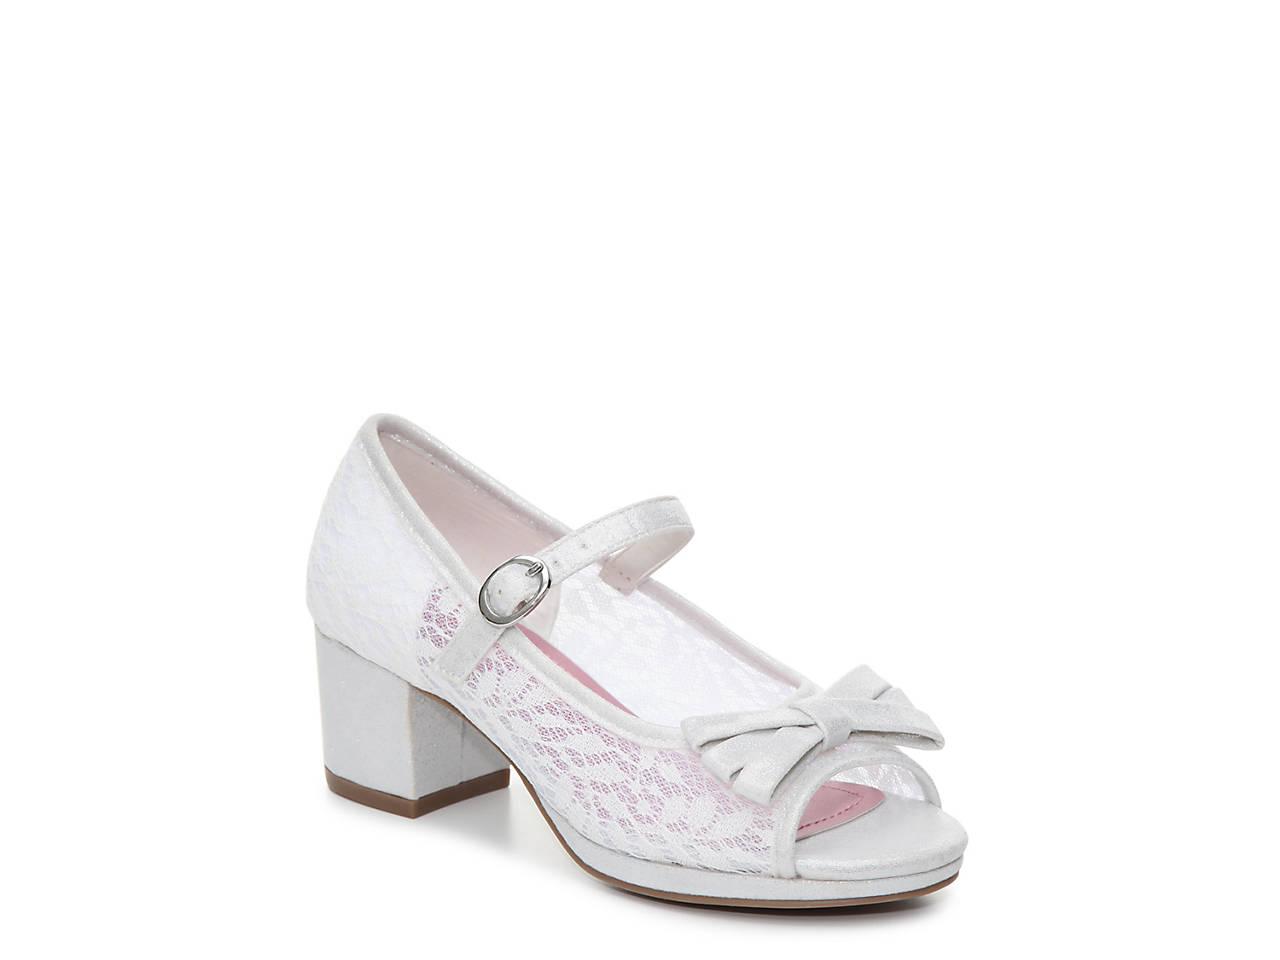 lace burgundy wearhouse ashlin comfortable mens dressy florsheim men shoes s up main dress comforter